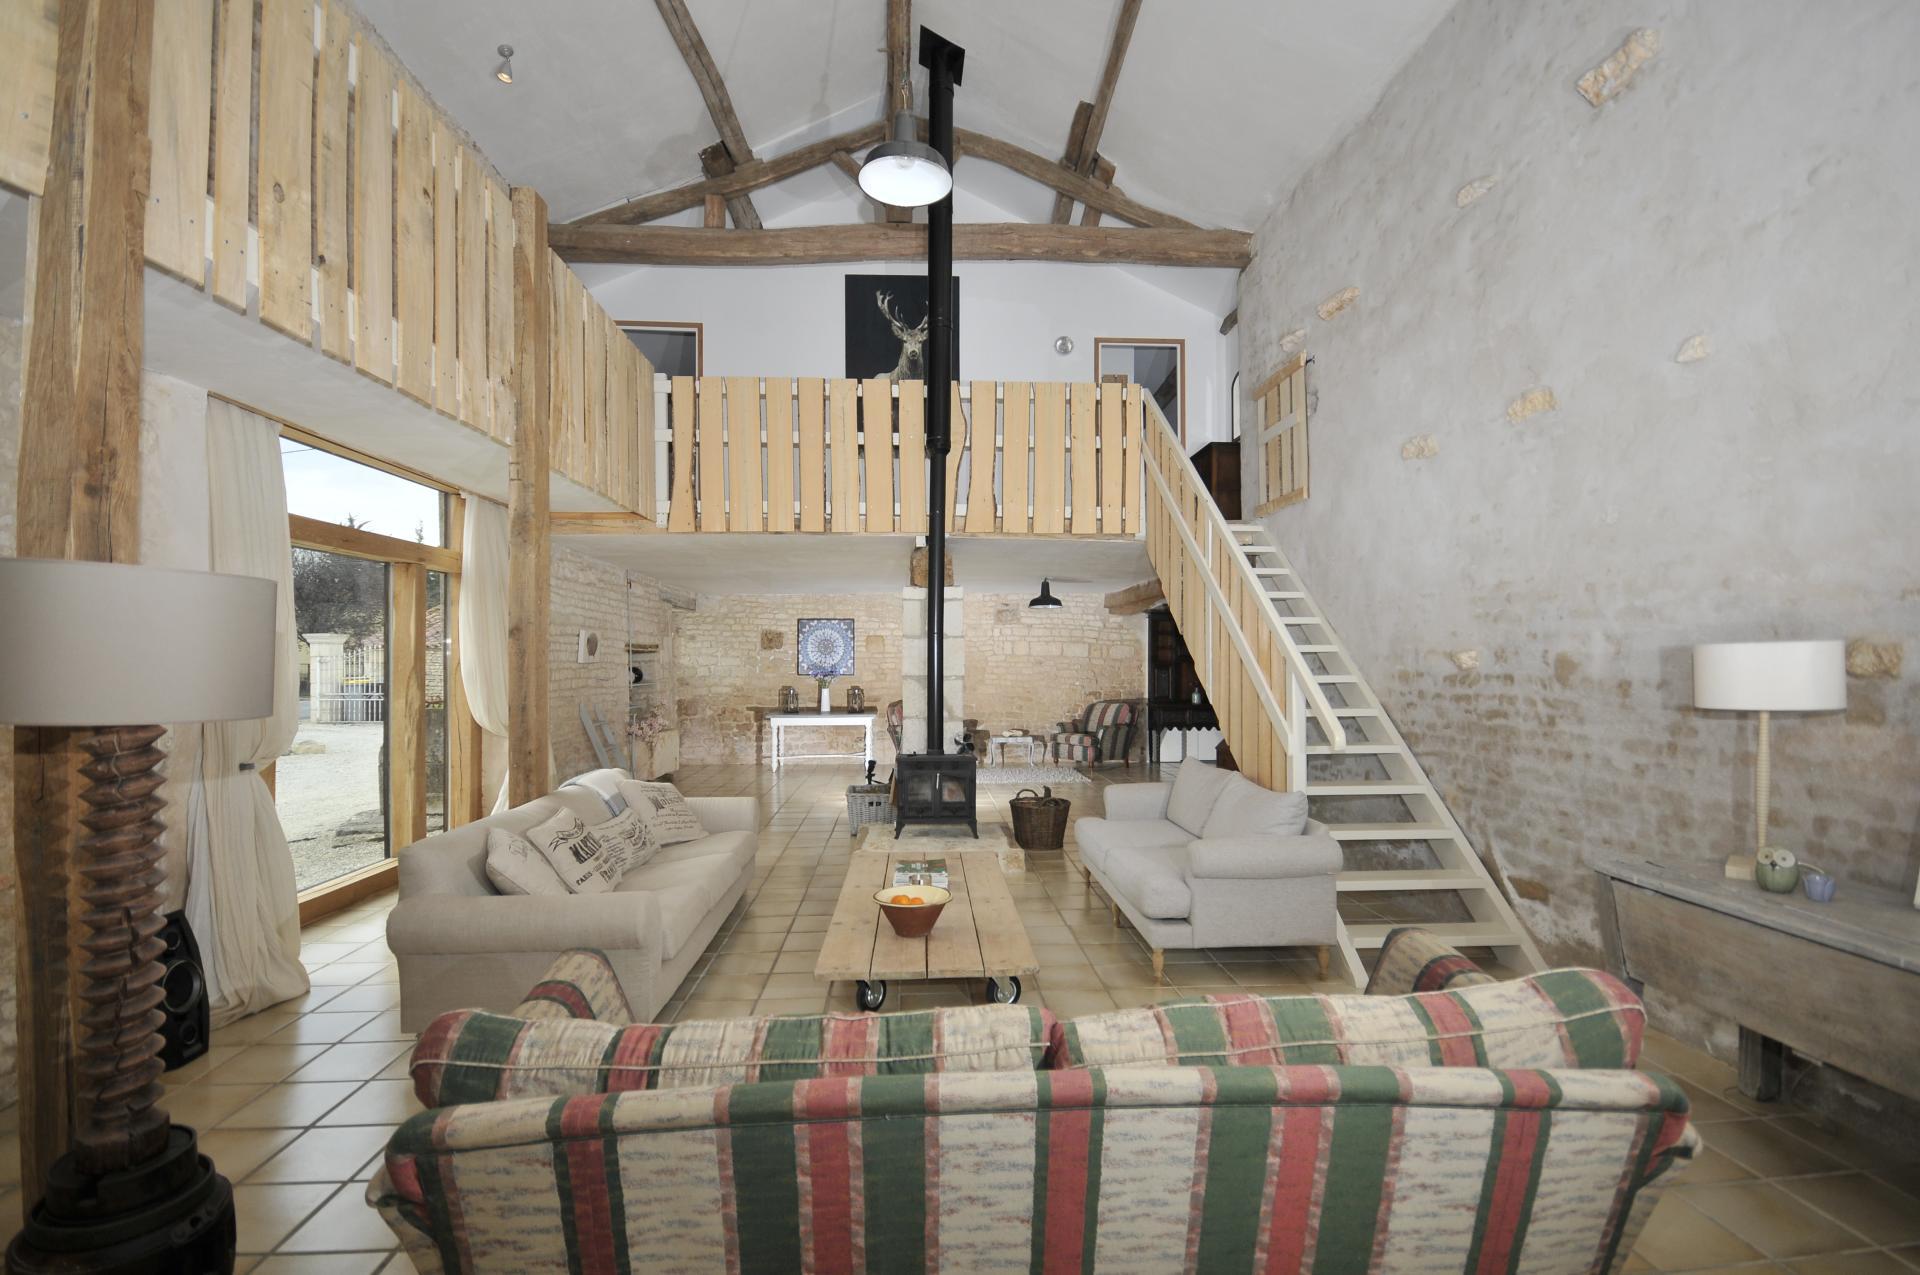 Living Room, Ferme Verger, Fontenay le Comte, Vendee Charente.